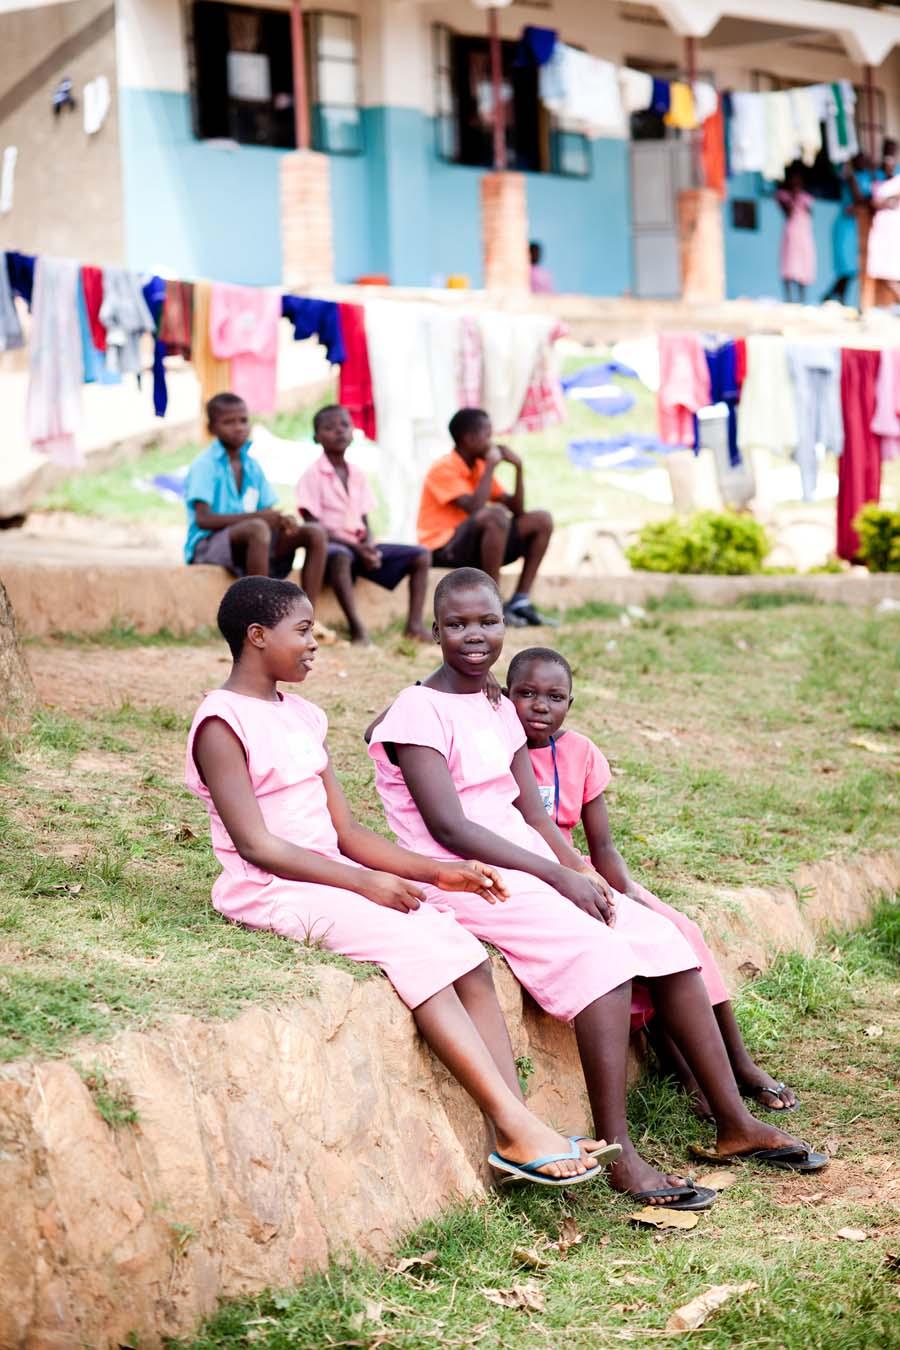 jessicadavisphotography.com | Jessica Davis Photography | Portrait Work in Uganda| Travel Photographer | World Event Photographs 3 (12).jpg